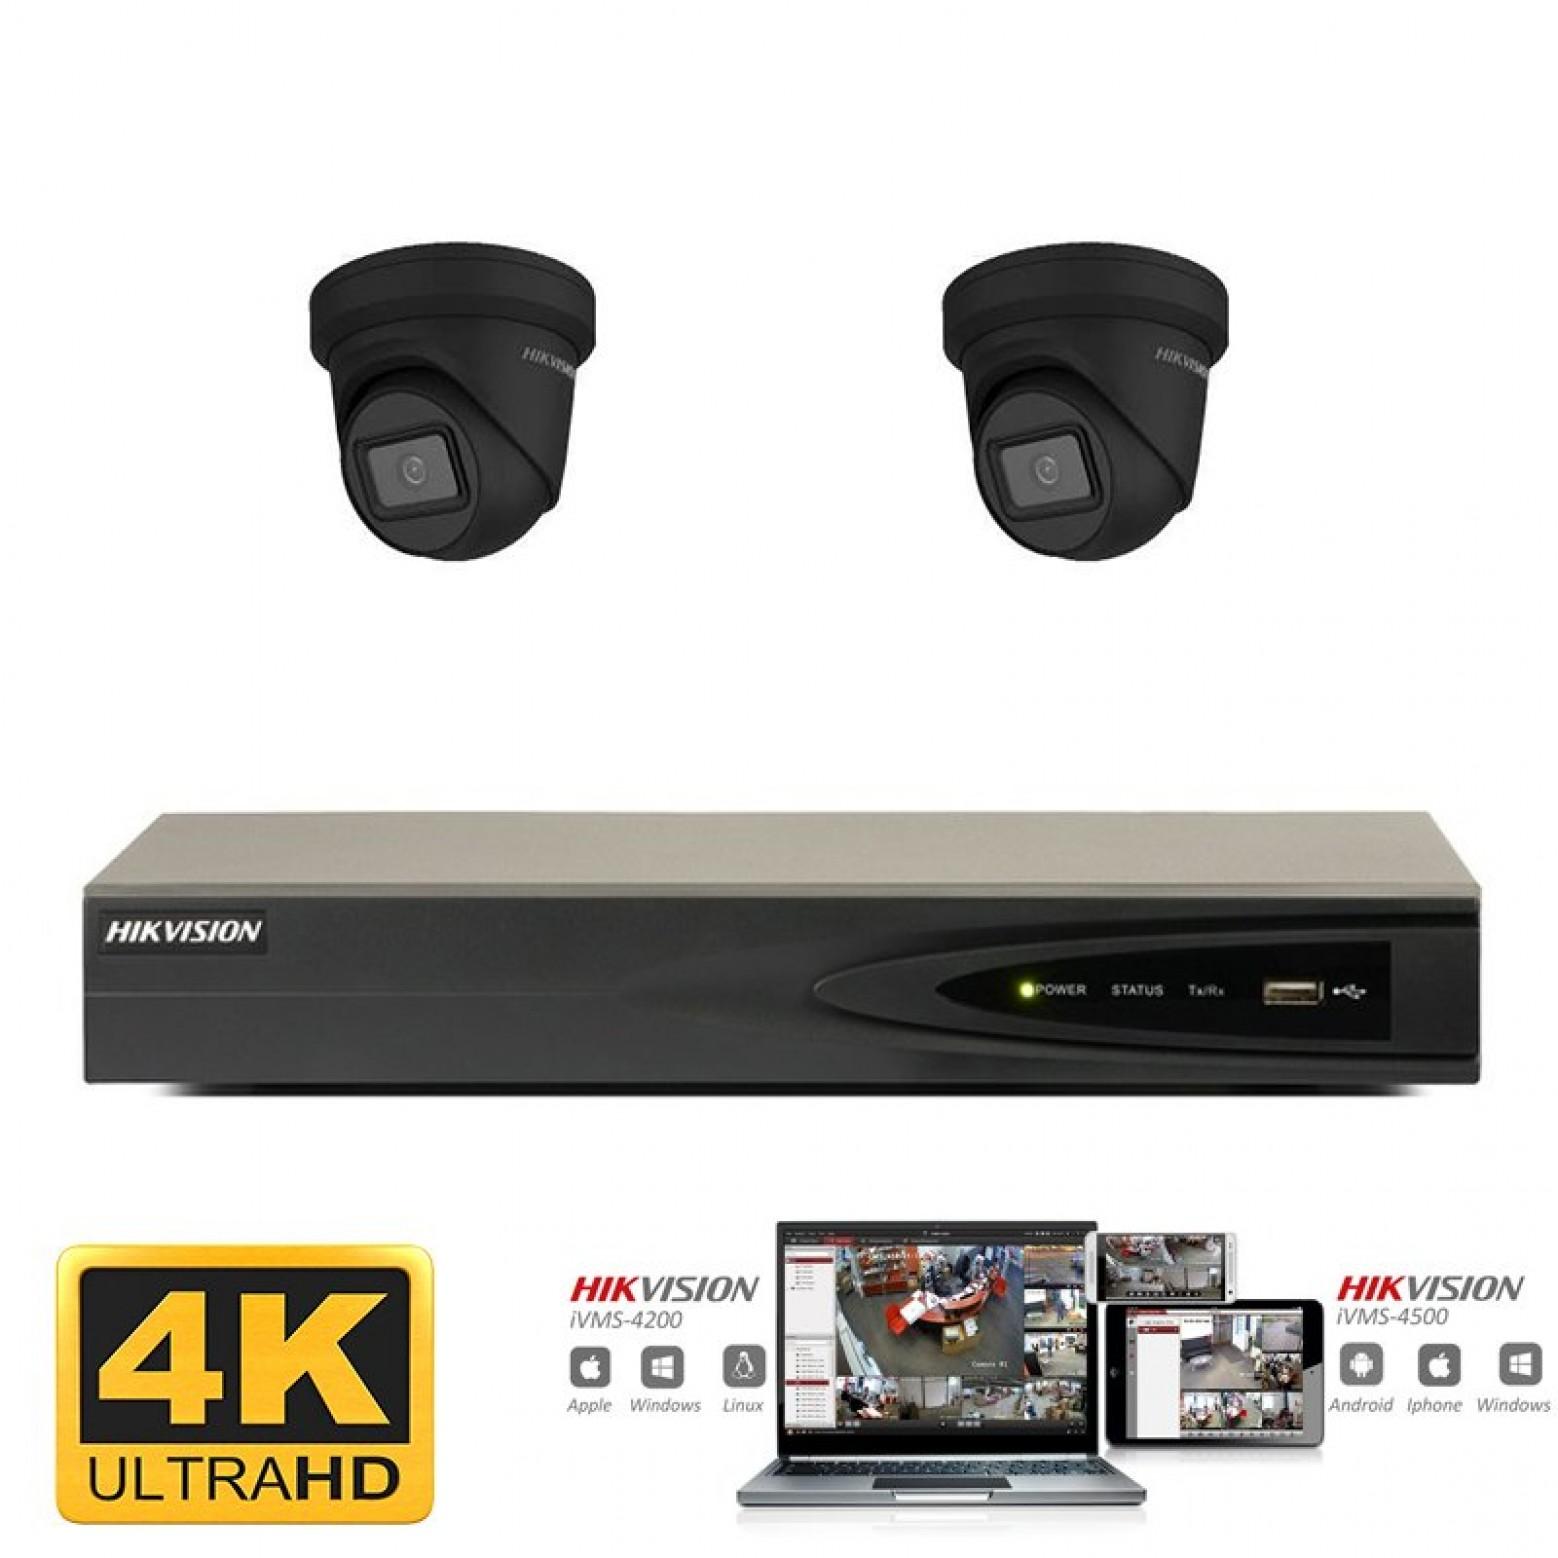 Hikvision IP camera set 2x turret zwart 8 megapixel (4K) Full HD